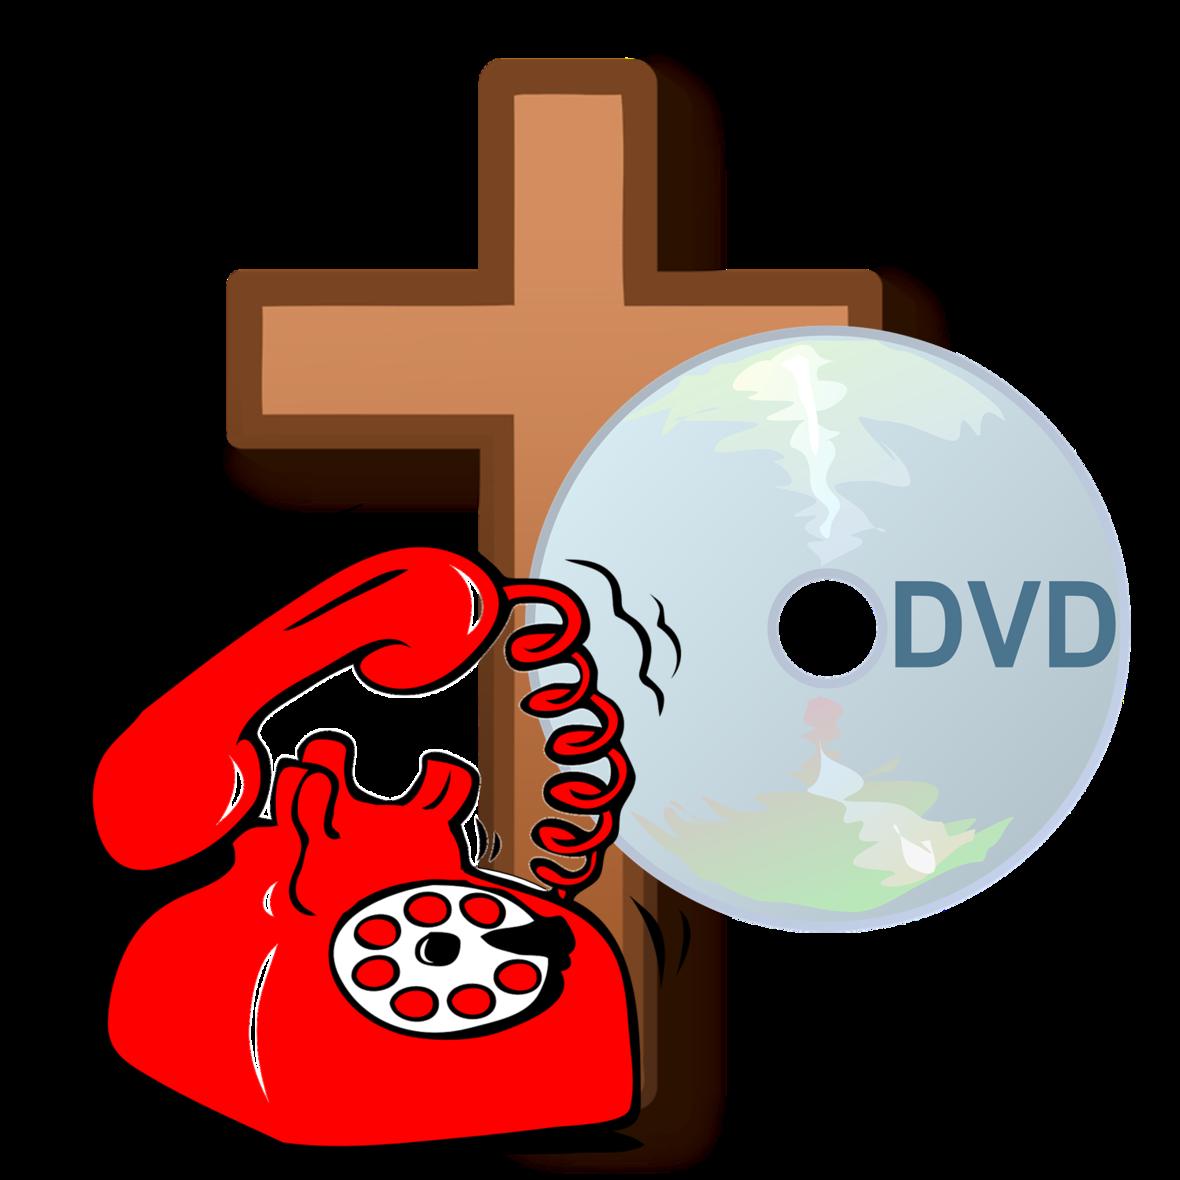 phone dvd